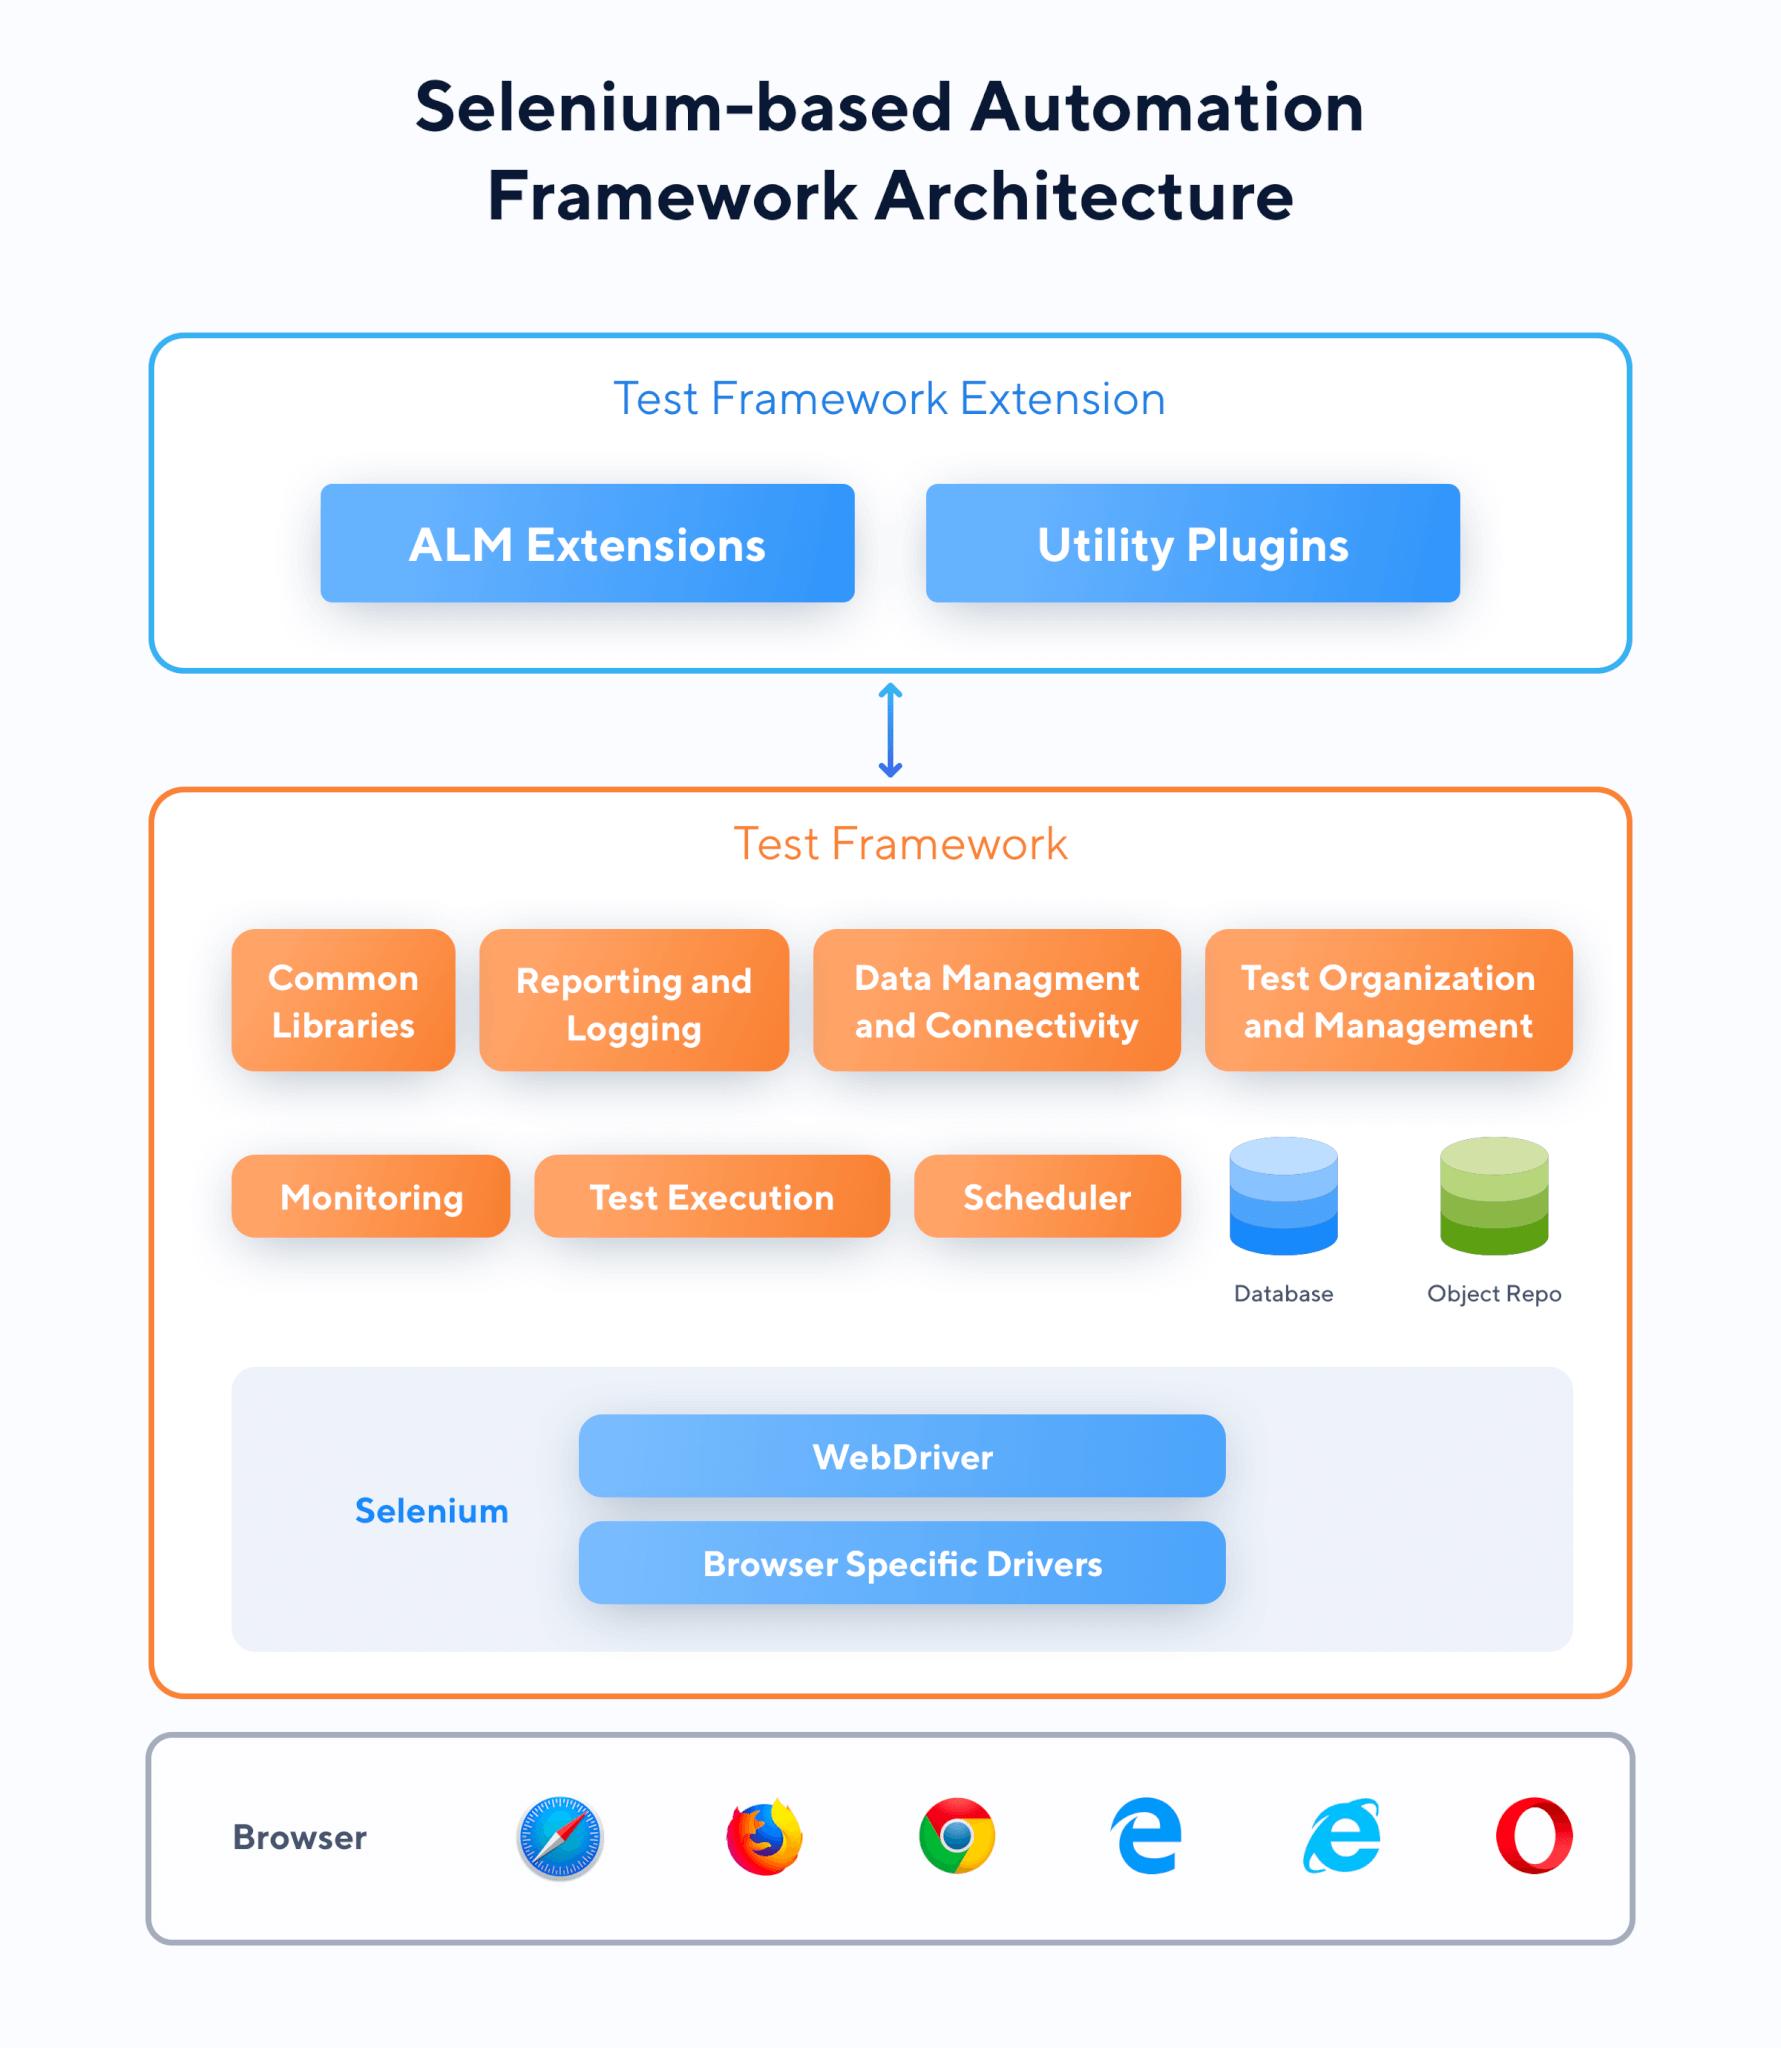 The Architecture of Selenium-based Test Frameworks